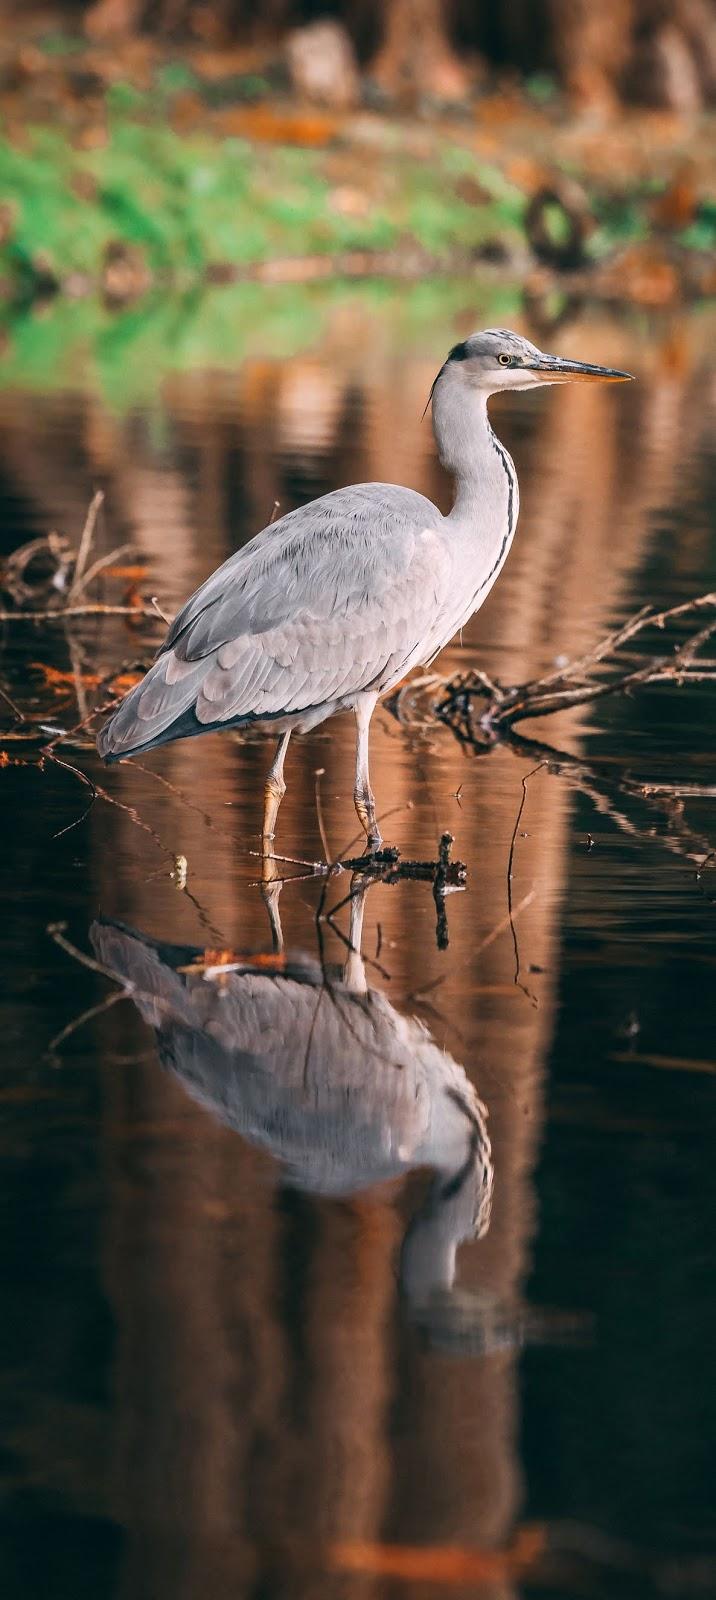 A wading heron.